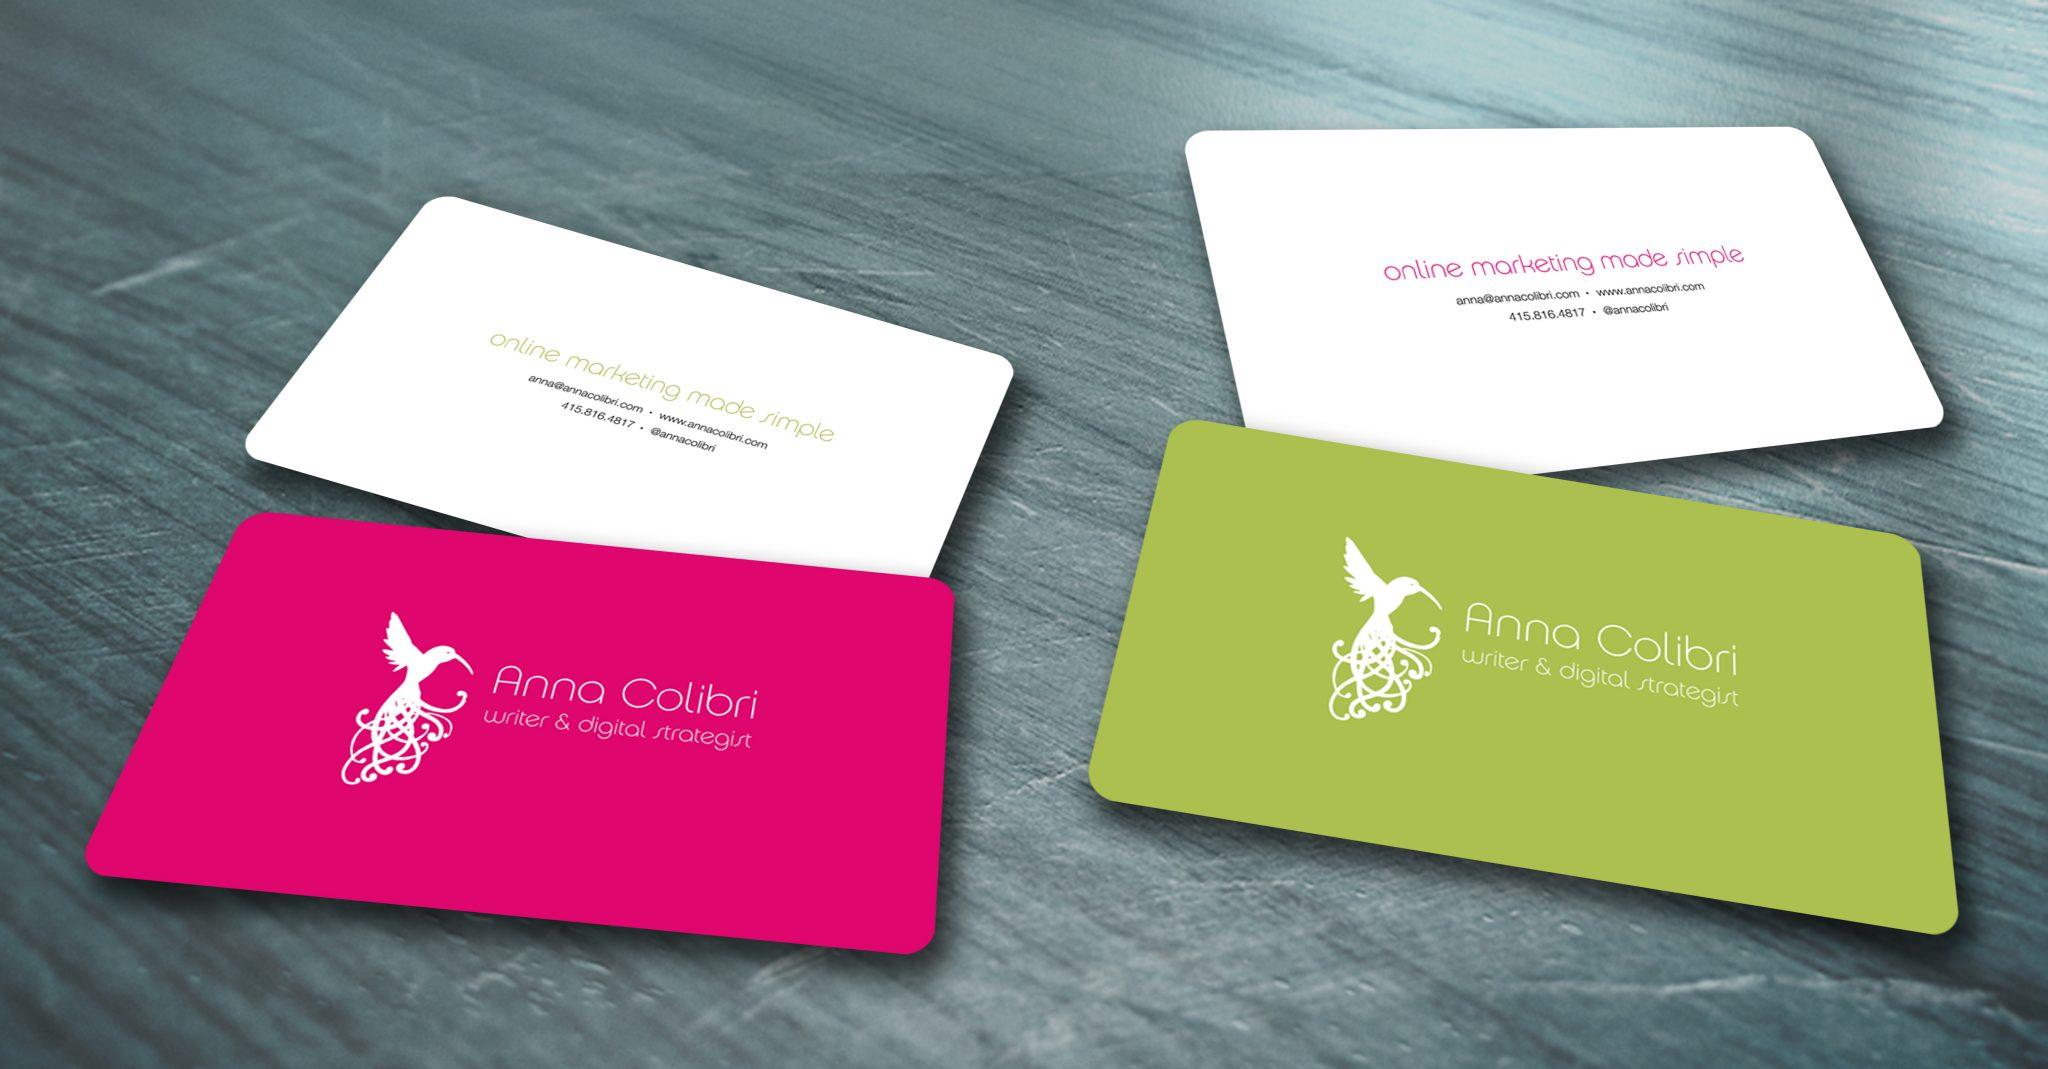 Card-Display • Colibri Digital Marketing